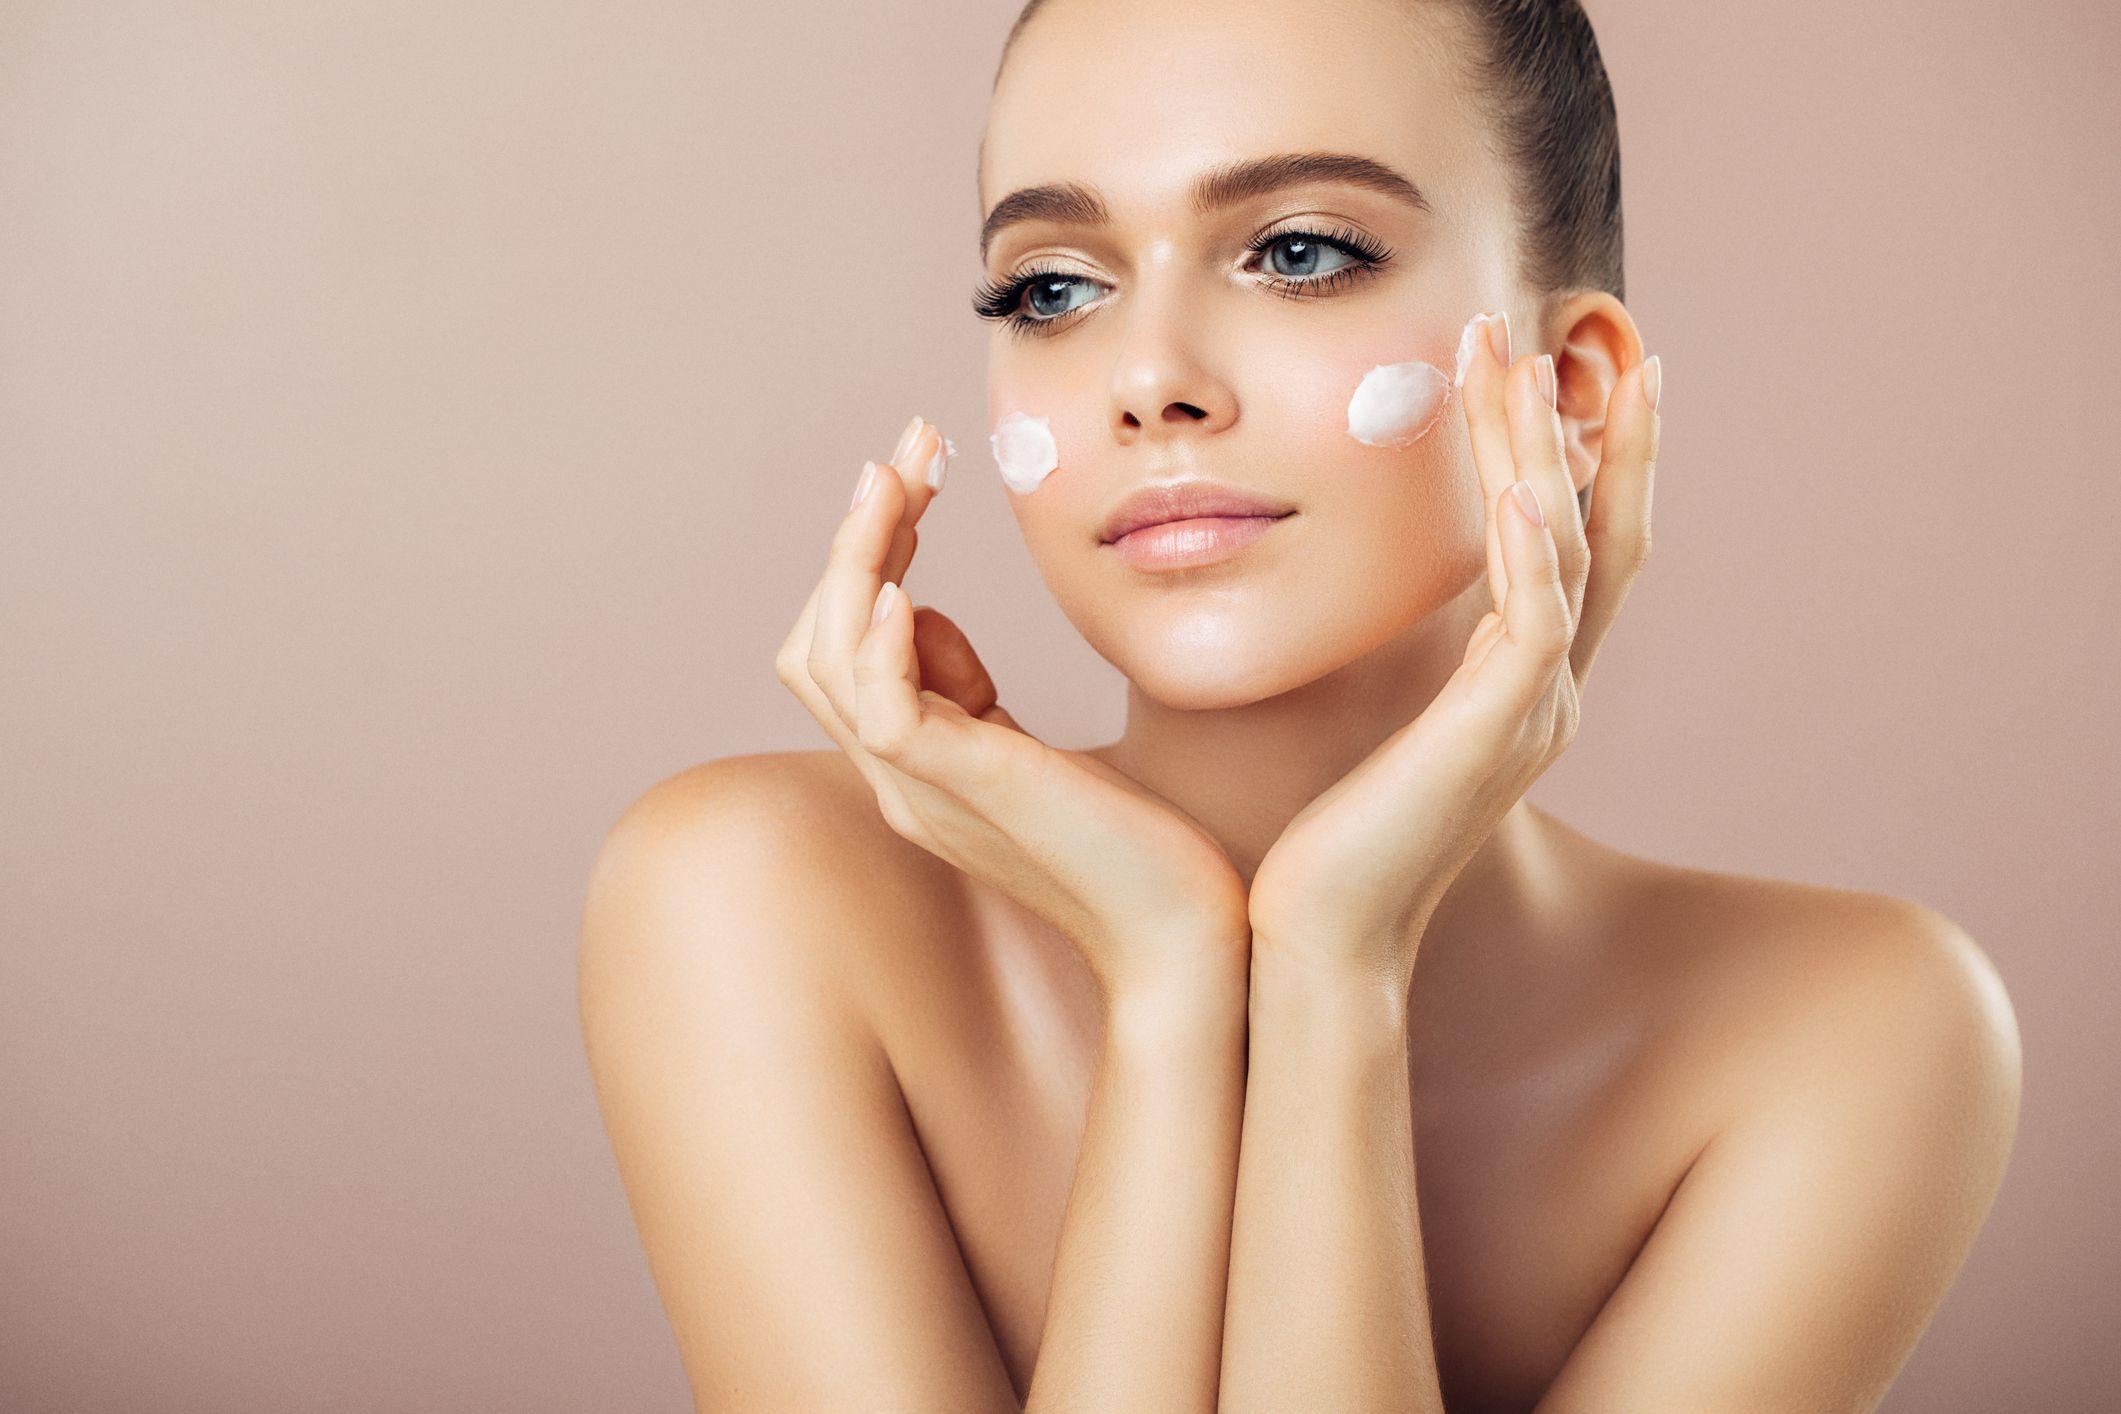 Collagena Lumiskin - cum se aplică corect, care sunt ingredientele active